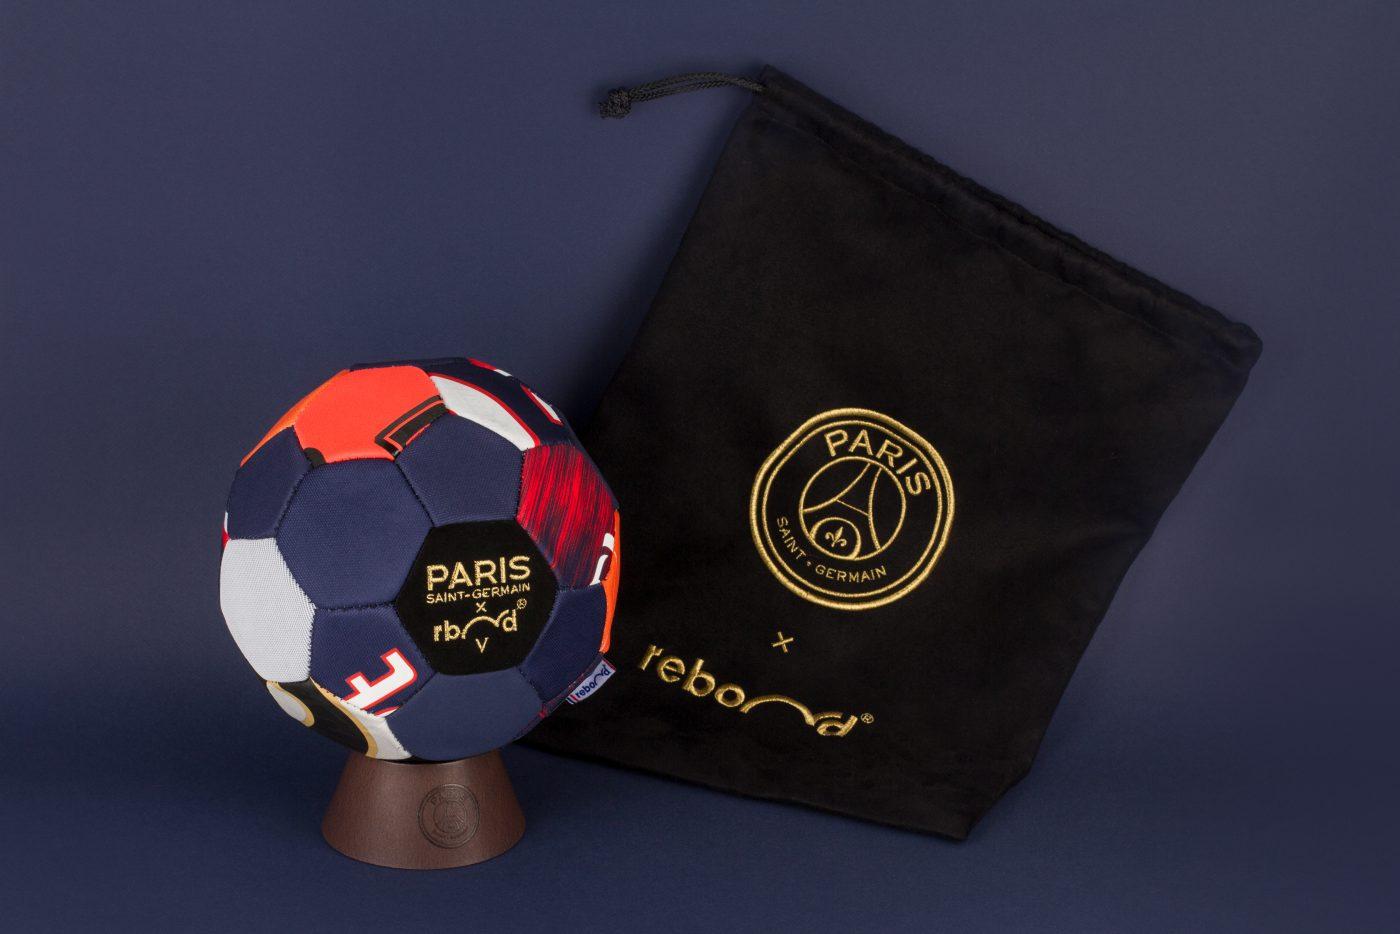 ballon-psg-rebond-4